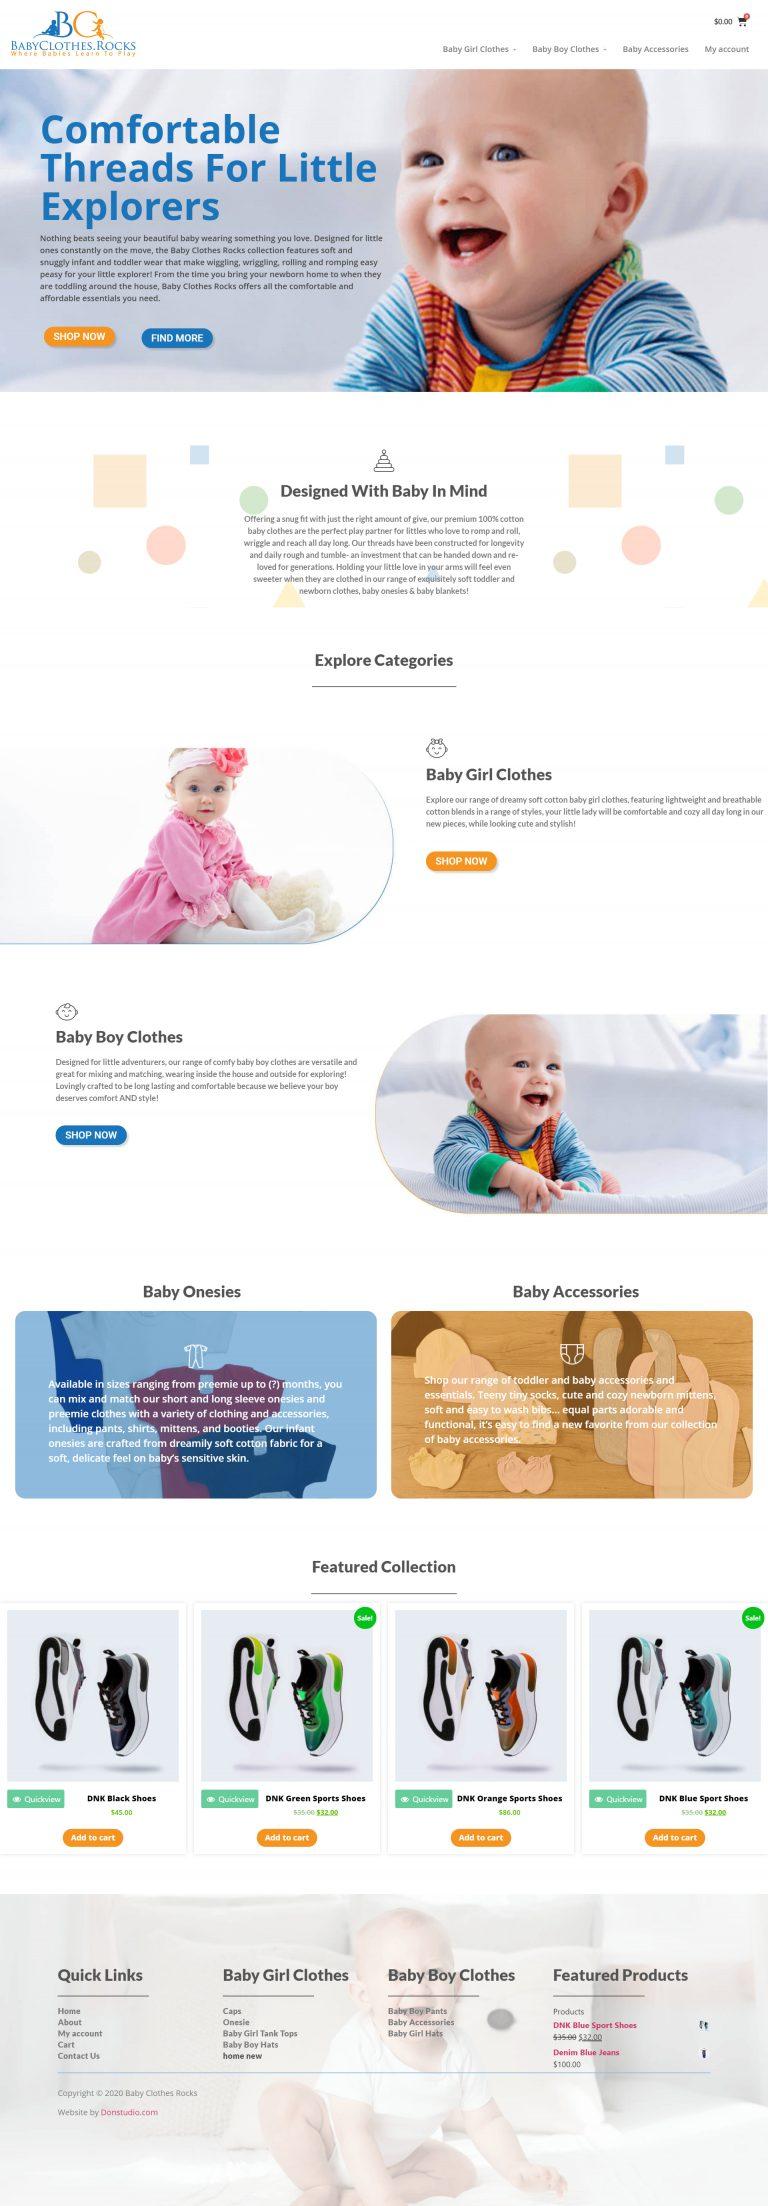 screencapture babyclothes rocks 2020 09 14 10 06 27